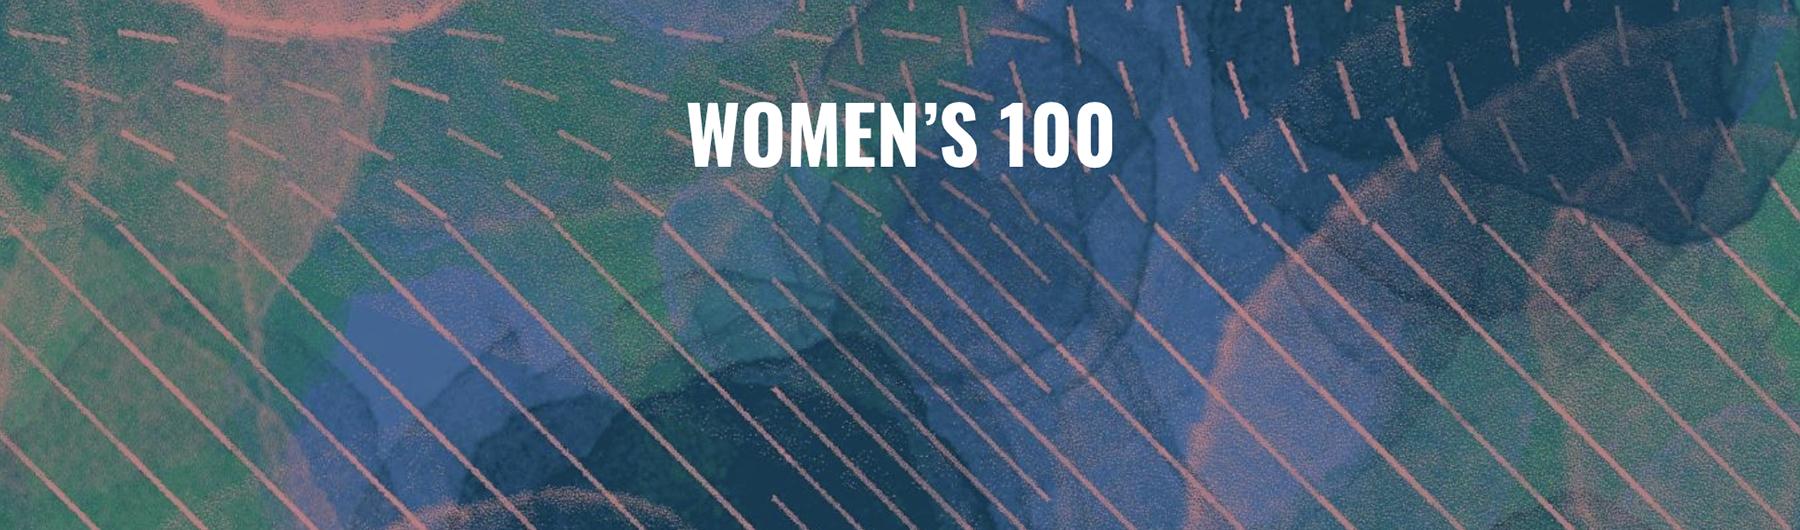 2021 Women's 100 - Culpeper, Virgina